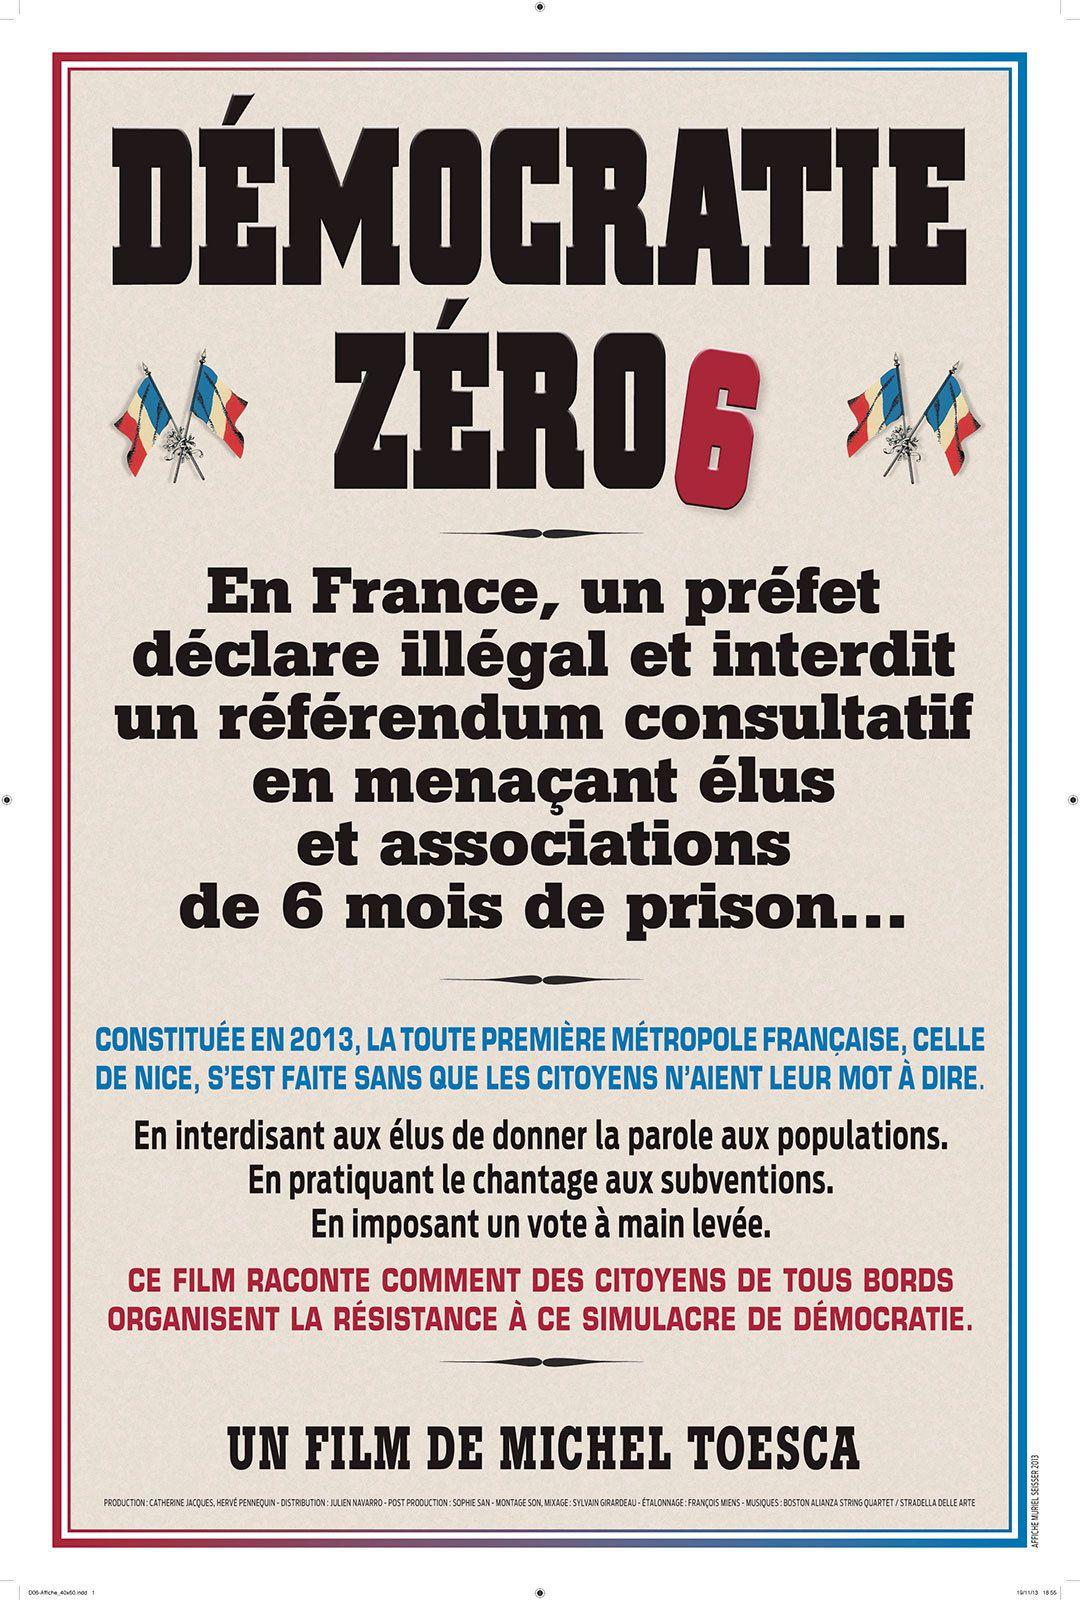 Démocratie Zéro6 - Documentaire (2014)